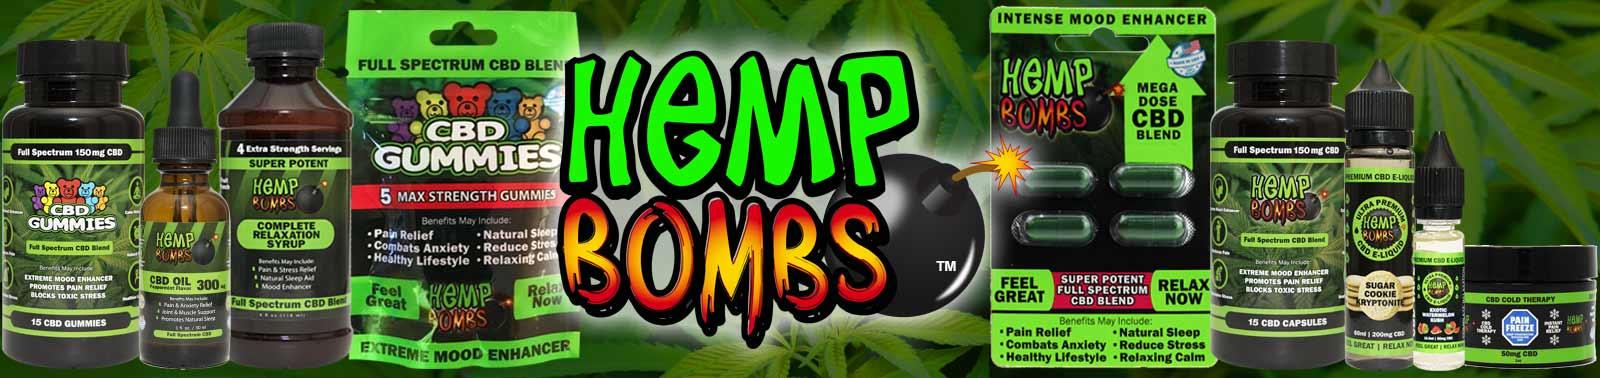 Premium CBD products from Hemp Bombs including CBD Gummies, CBD Oil, CBD Syrup, Capsules, Vape and Pain Rub